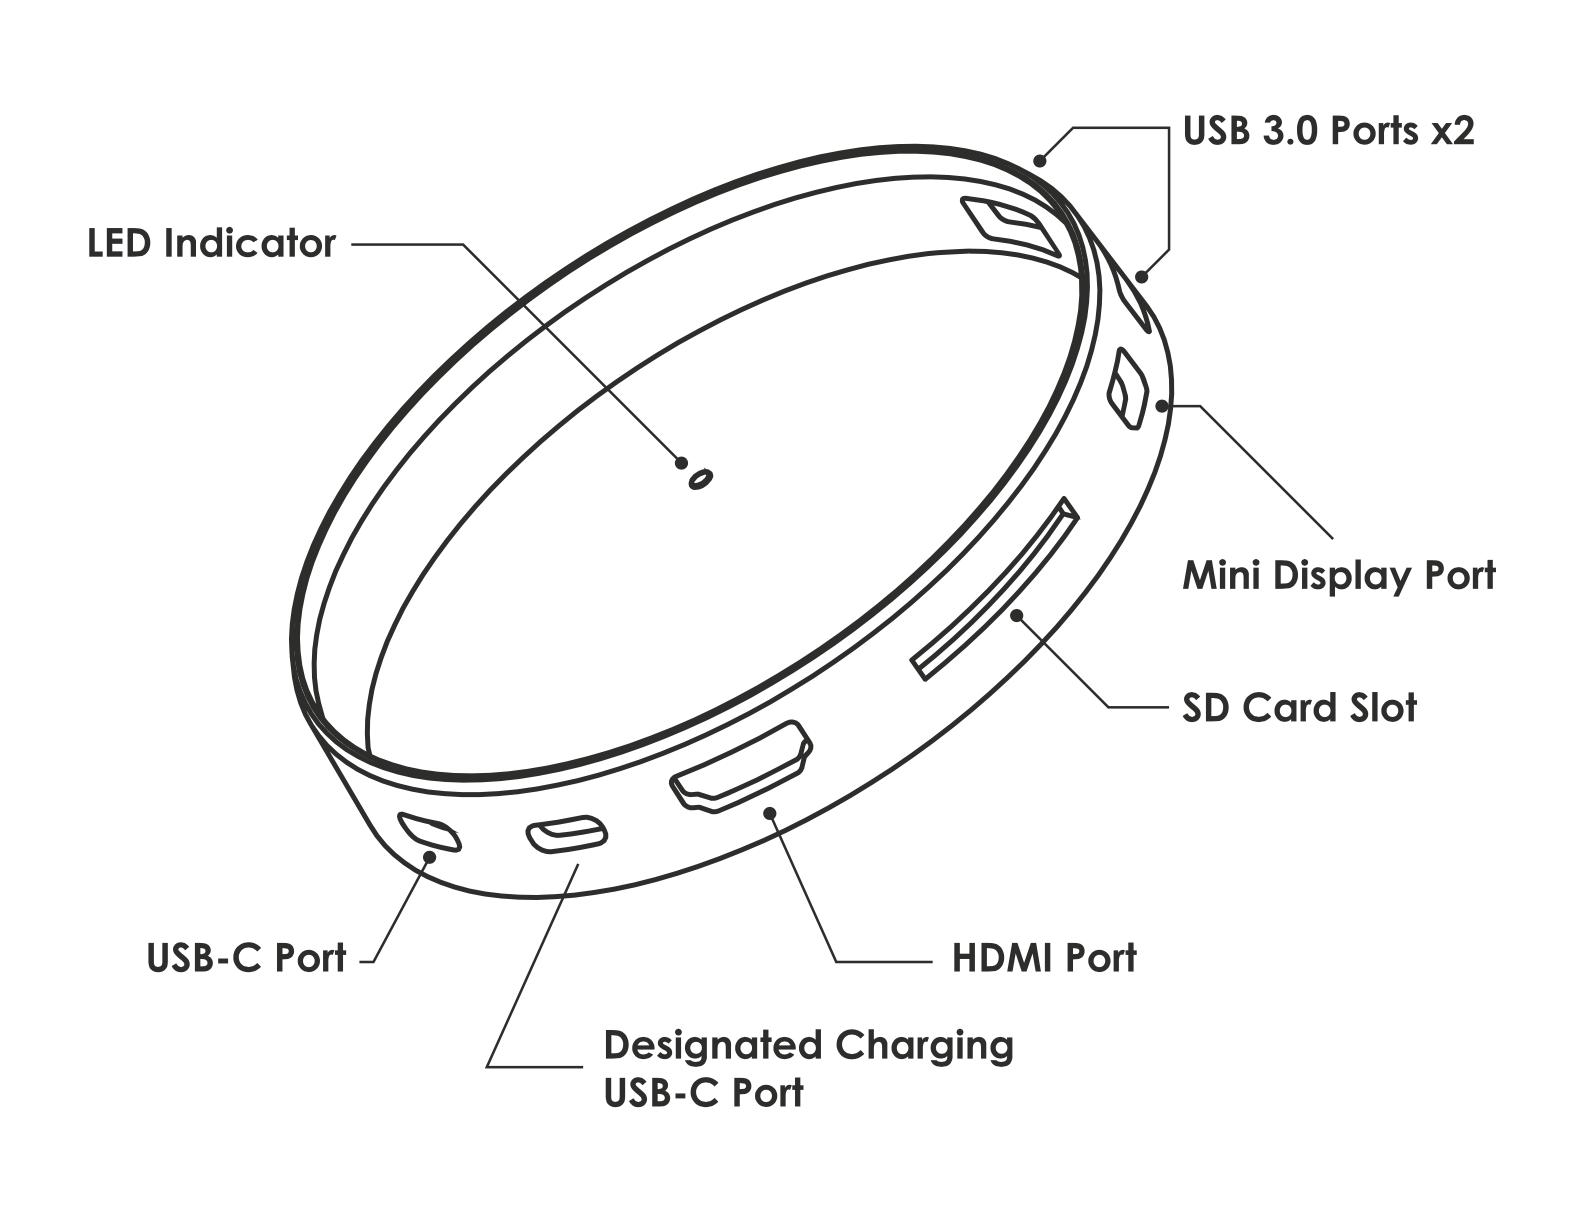 Photo showing Arc Hub our Thunderbolt 3 compatible USB-C Hub with HDMI, Mini DisplayPort SD Card, USB-C and USB 3.0 ports.